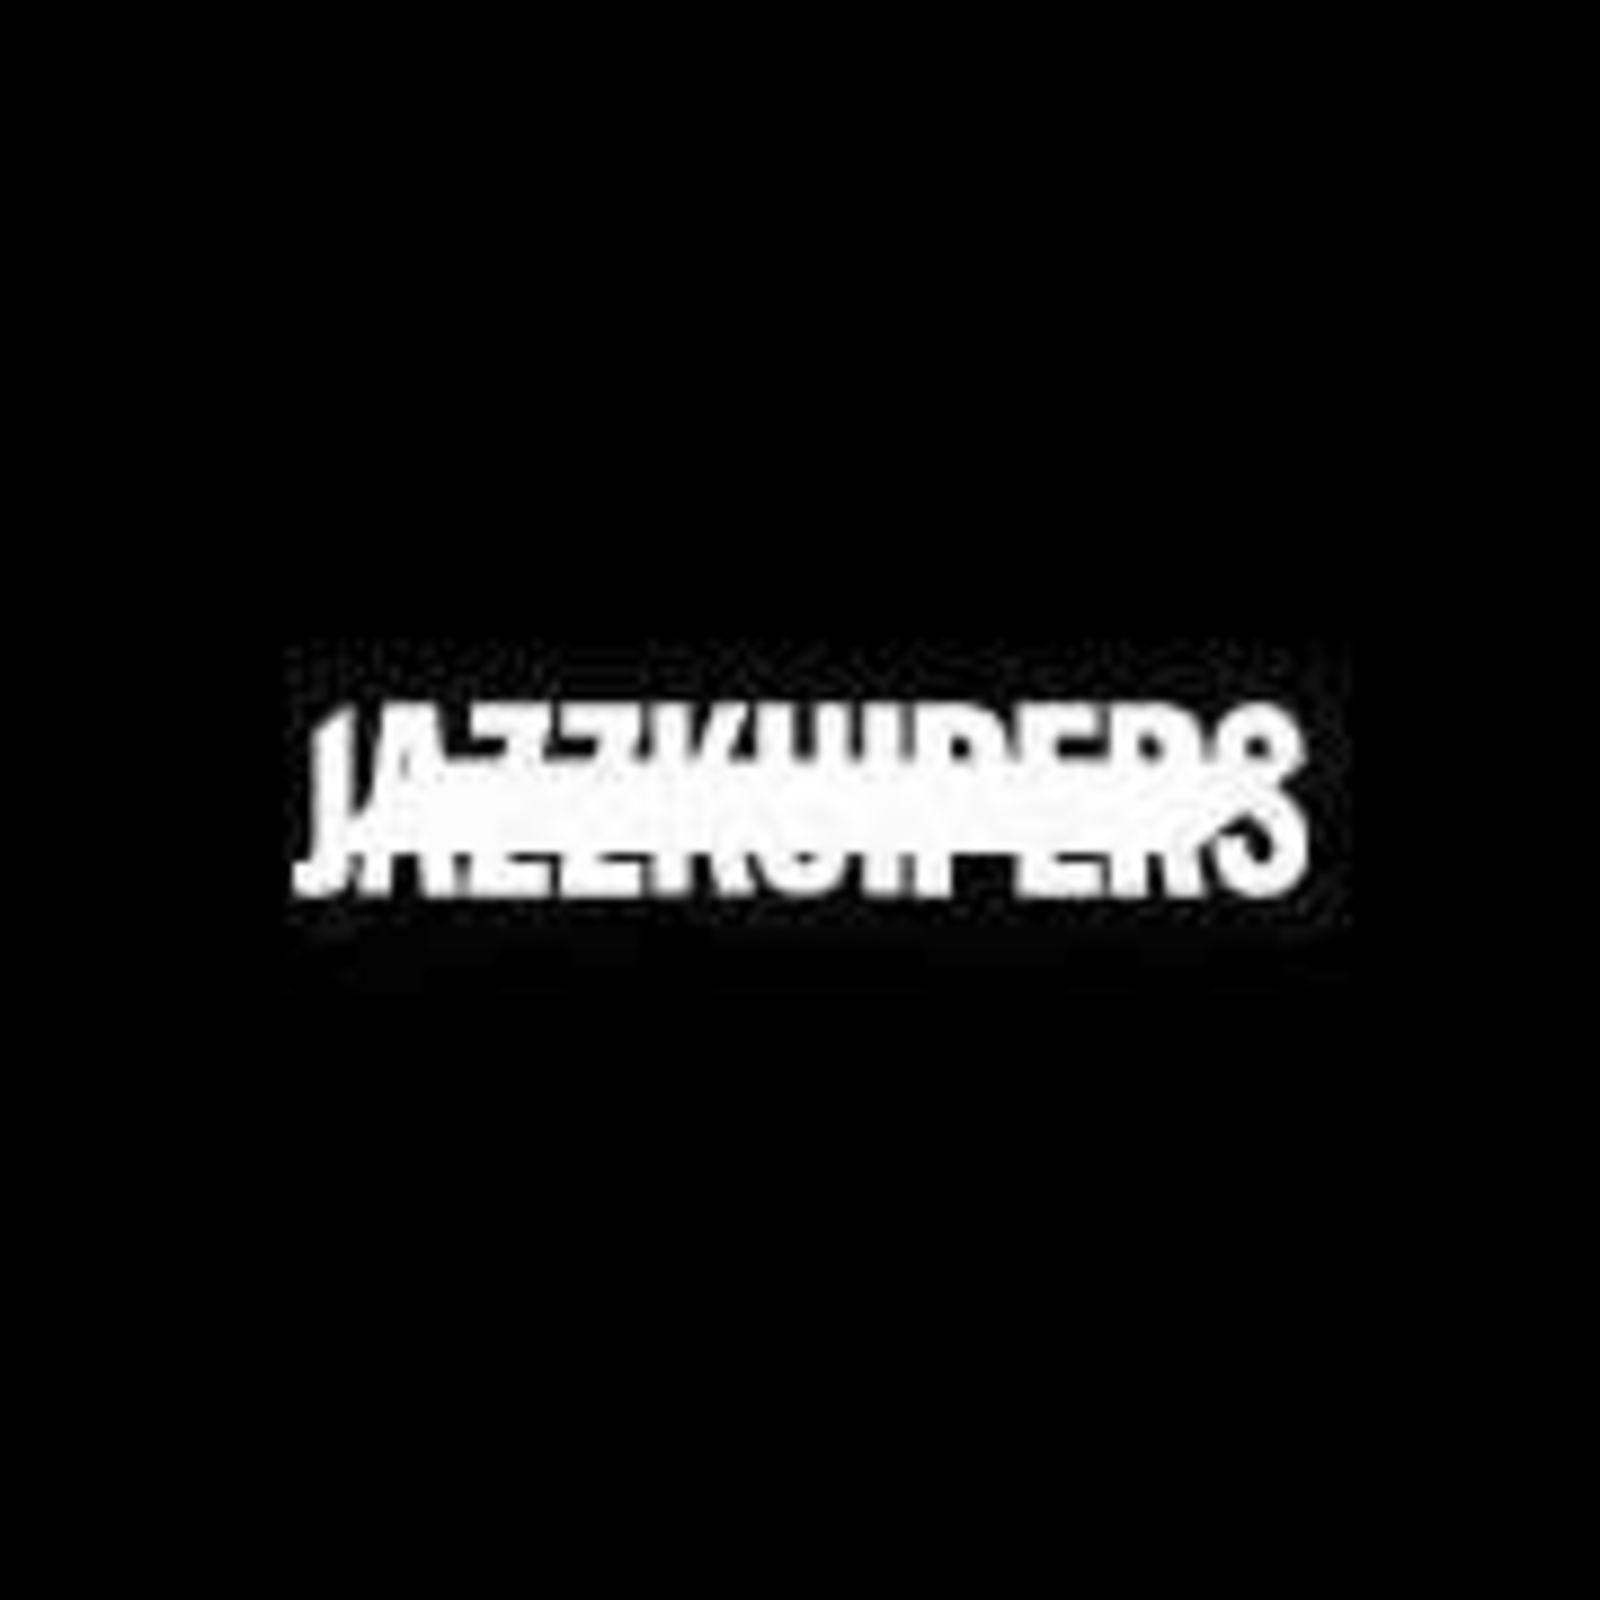 JAZZ KUIPERS